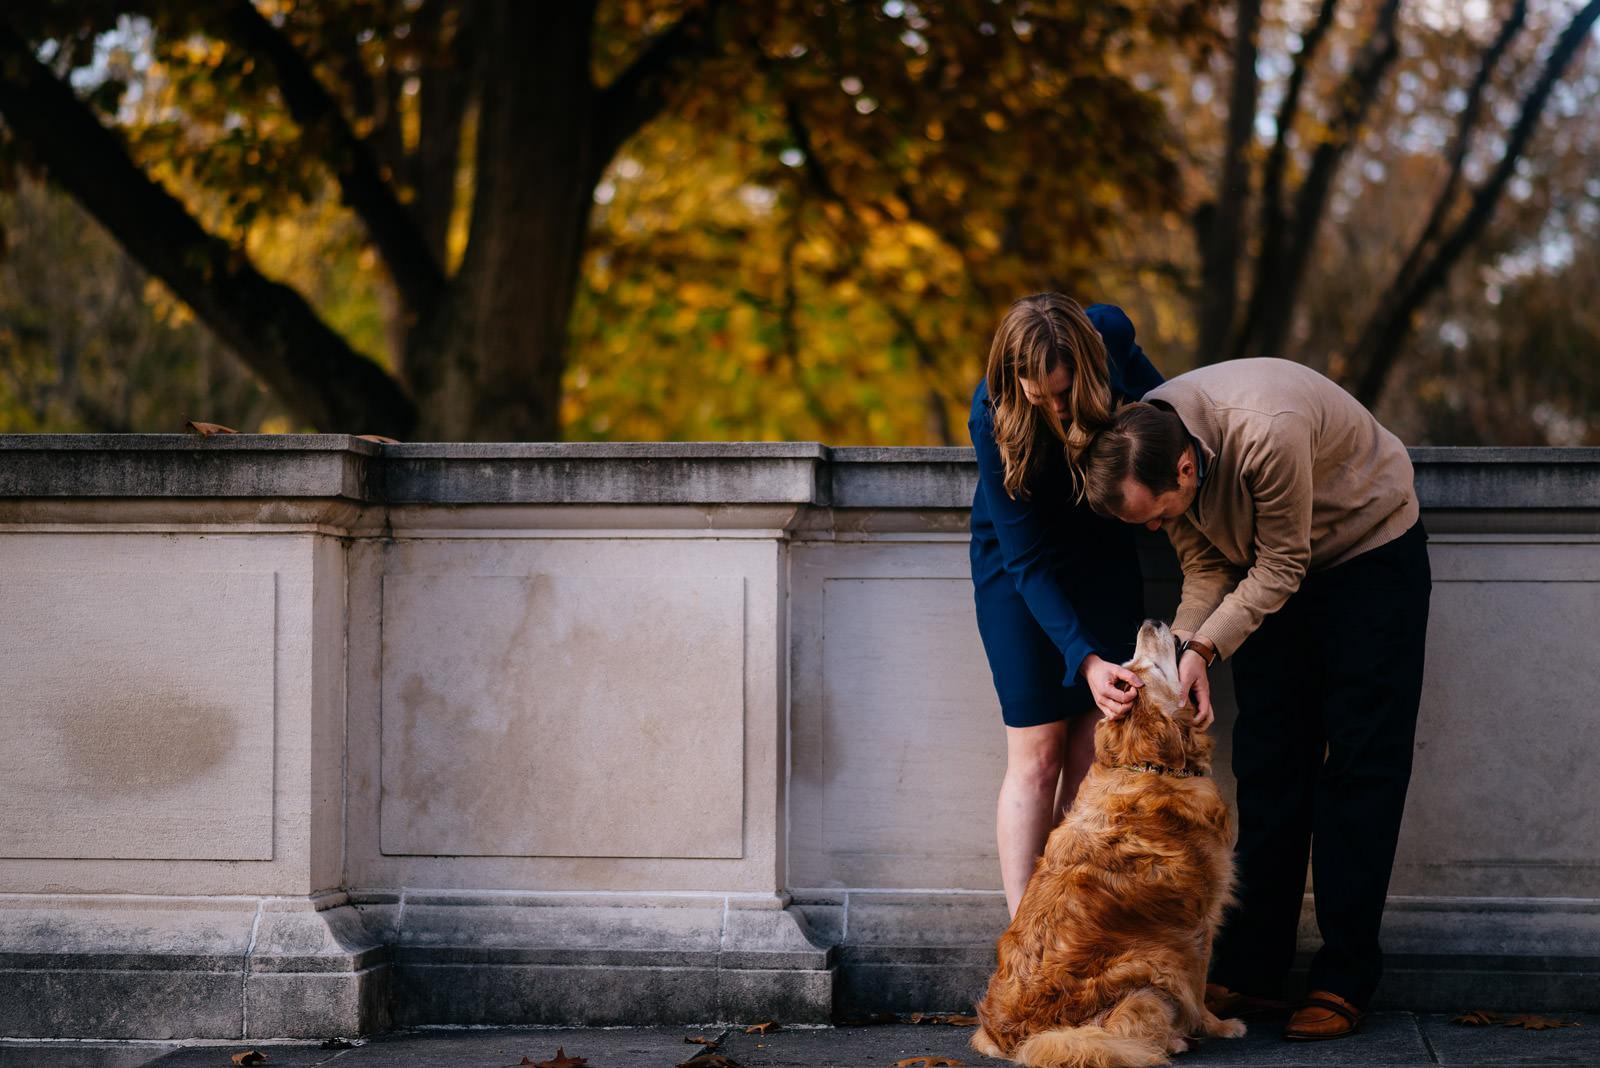 petting a good doggo